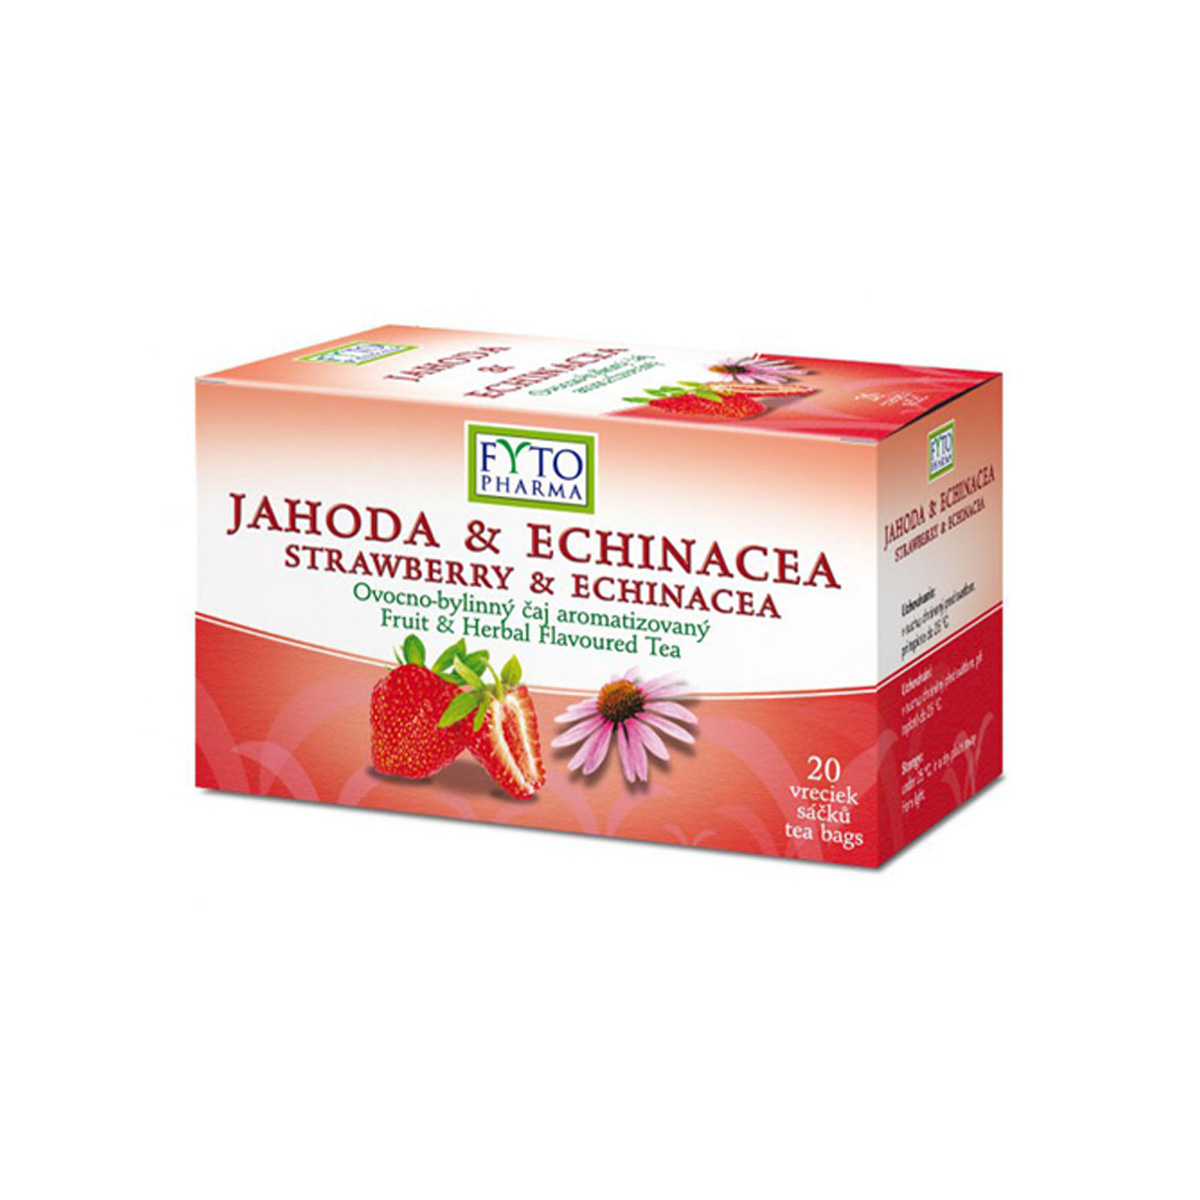 Fytopharma Ovocno-bylinný čaj jahoda & echinacea 20 x 2 g